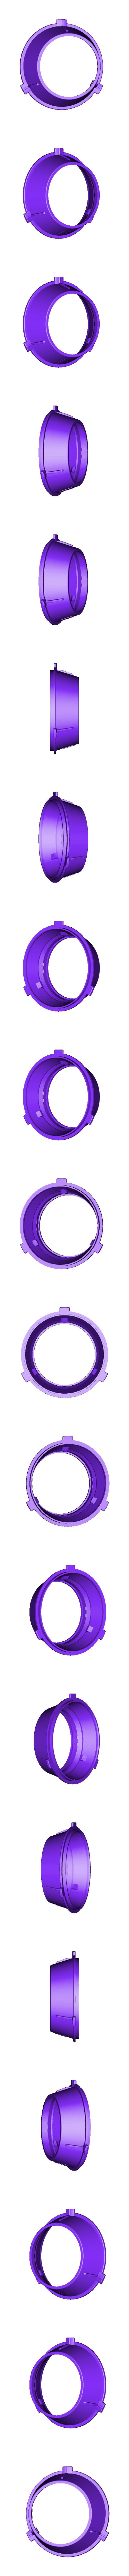 Lens_Cap_A.stl Download free STL file Oculus Rift DK2 • 3D printing object, indigo4